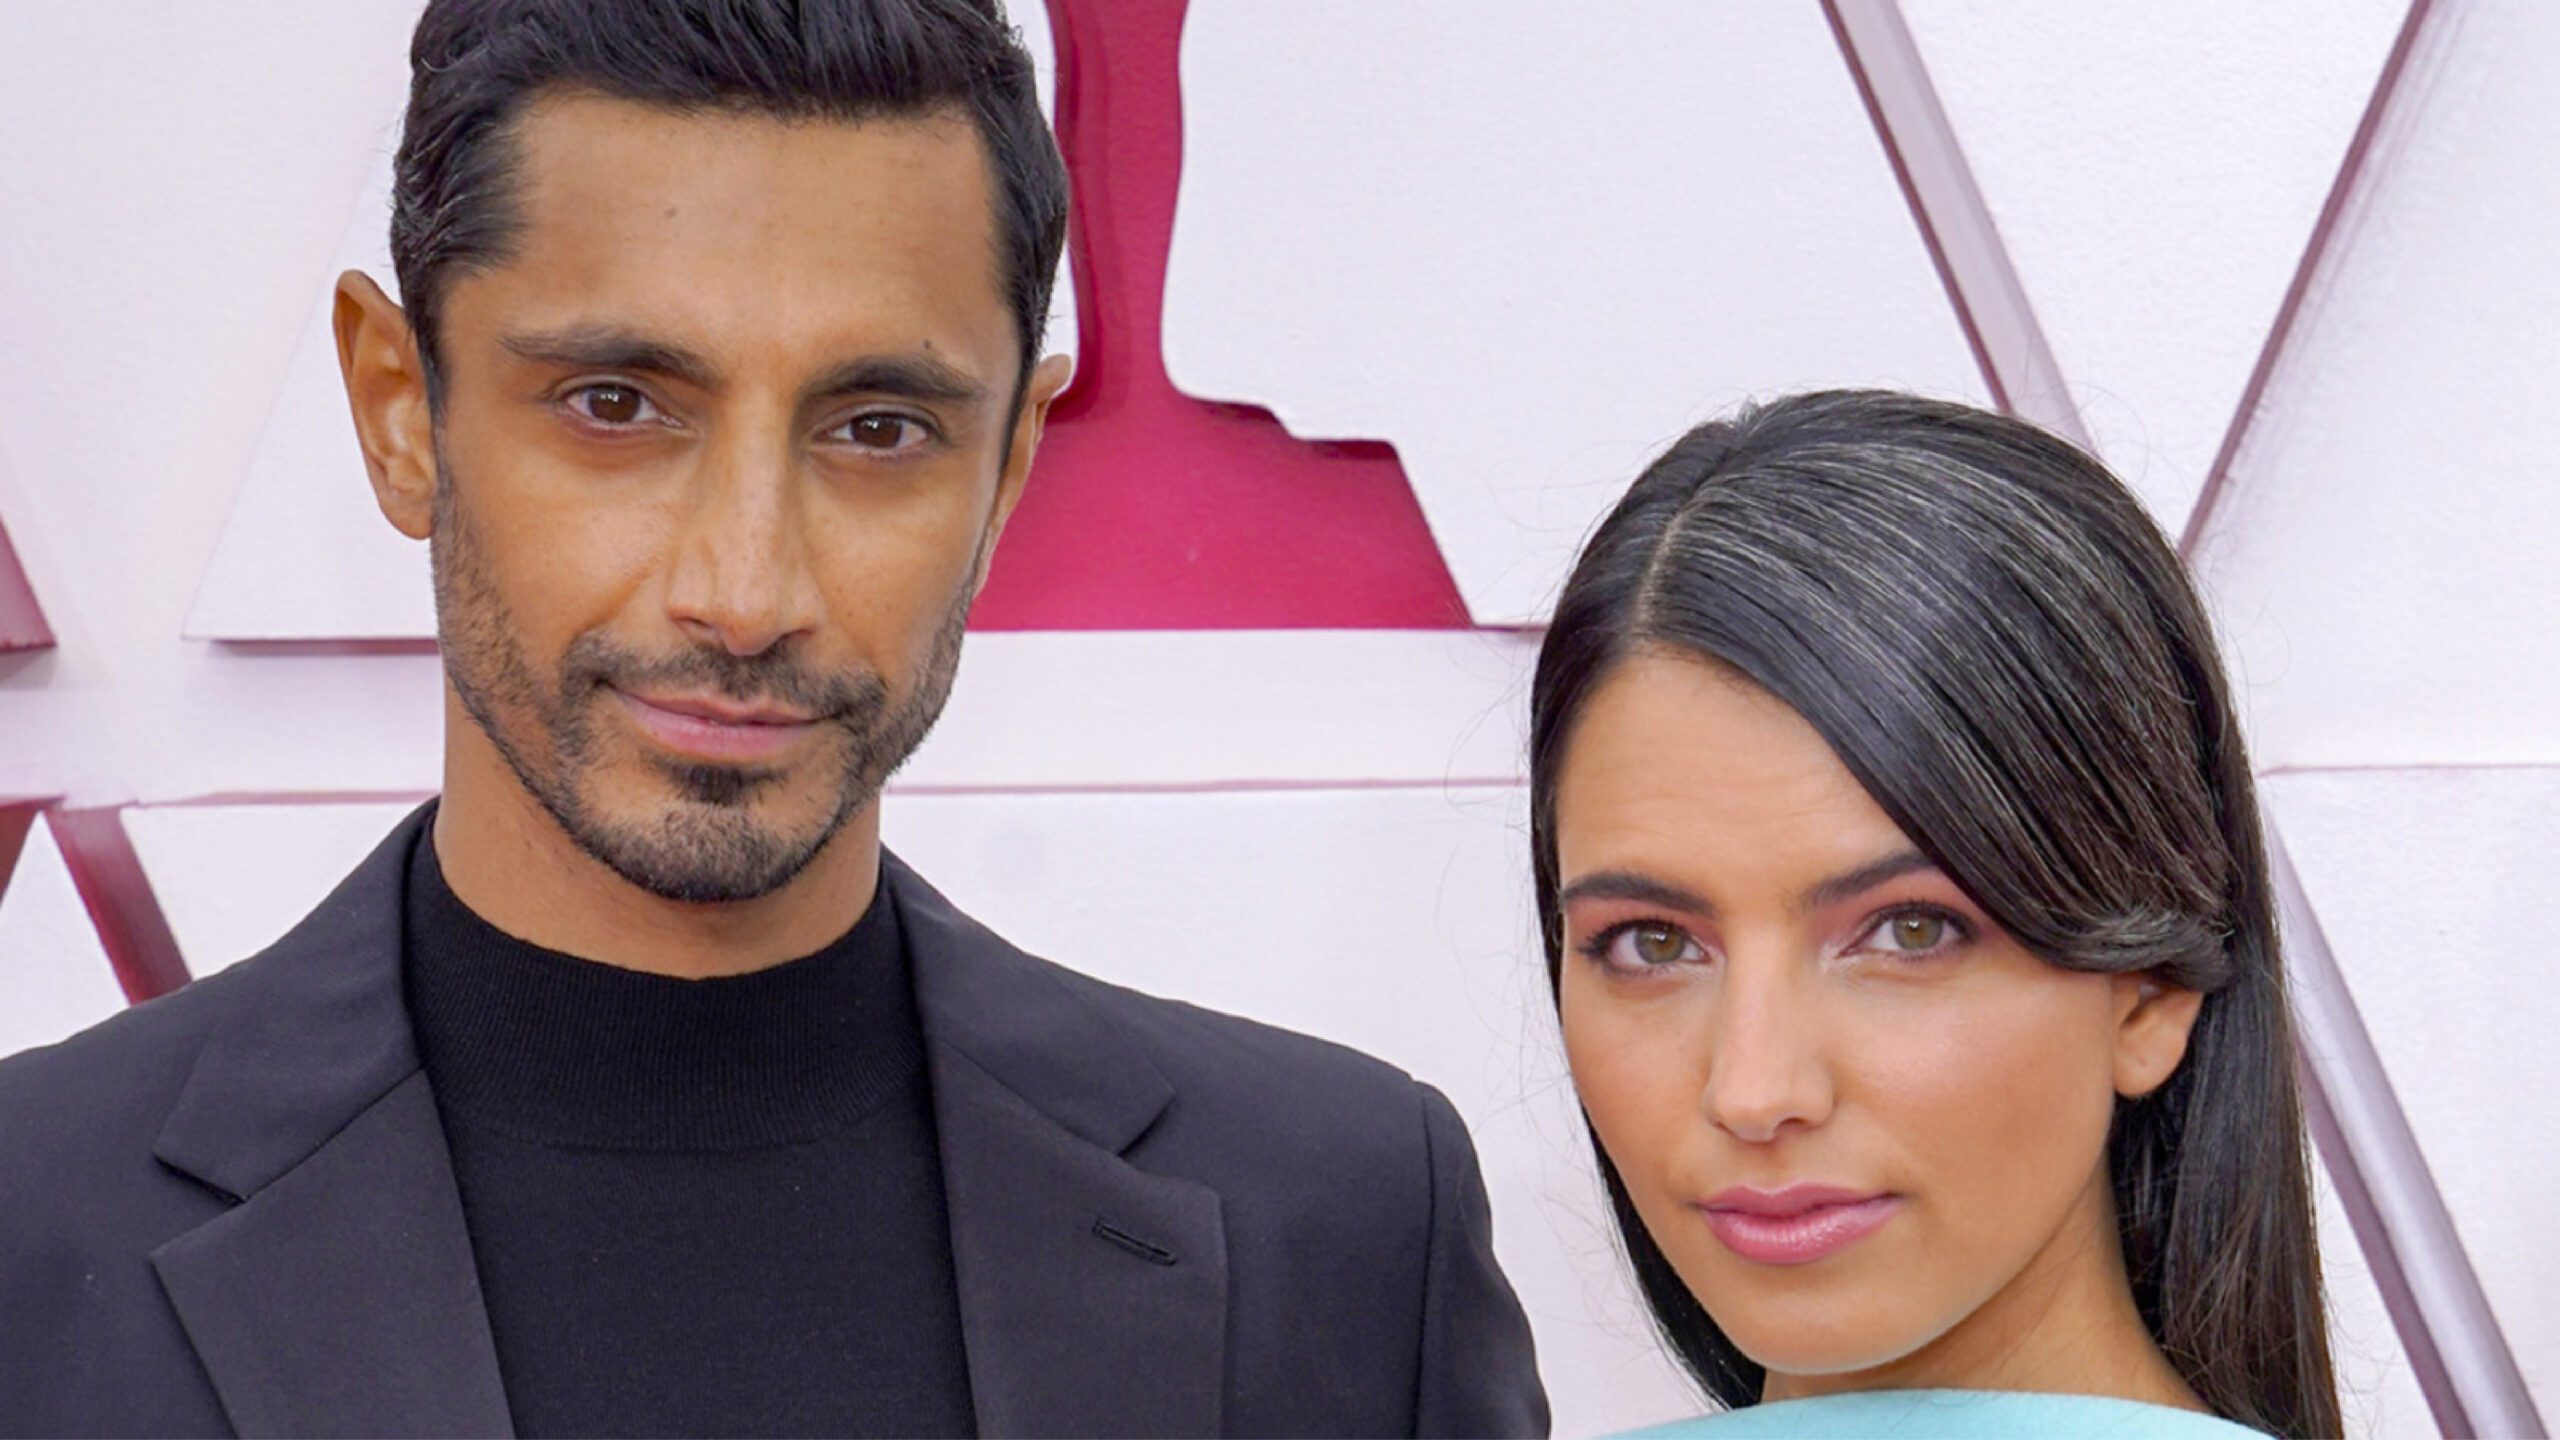 Oscars 2021: Riz Ahmed wins internet as he fixes wife Fatima's hair